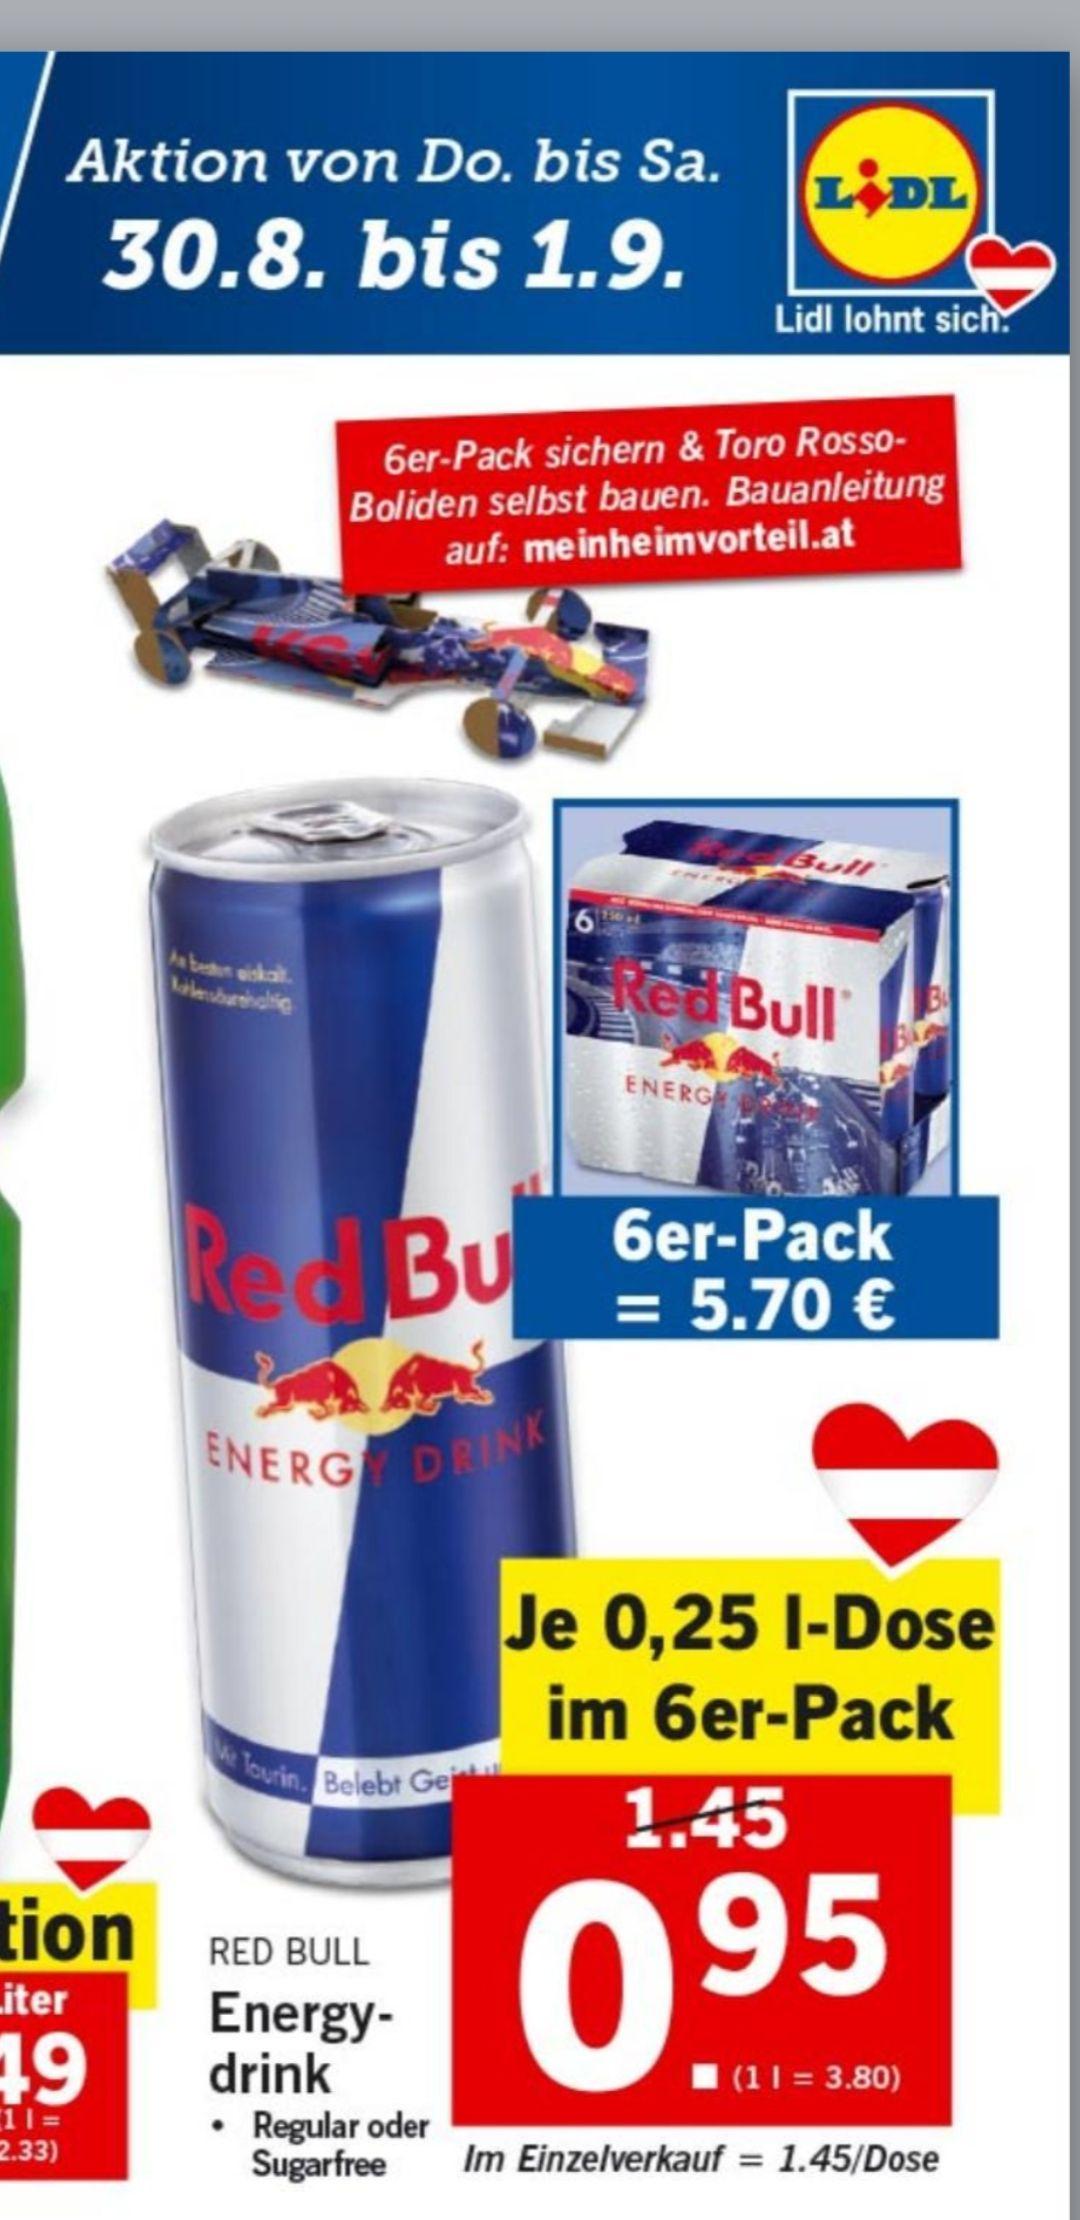 Red Bull im 6er-Pack um nur 0.95 pro Dose